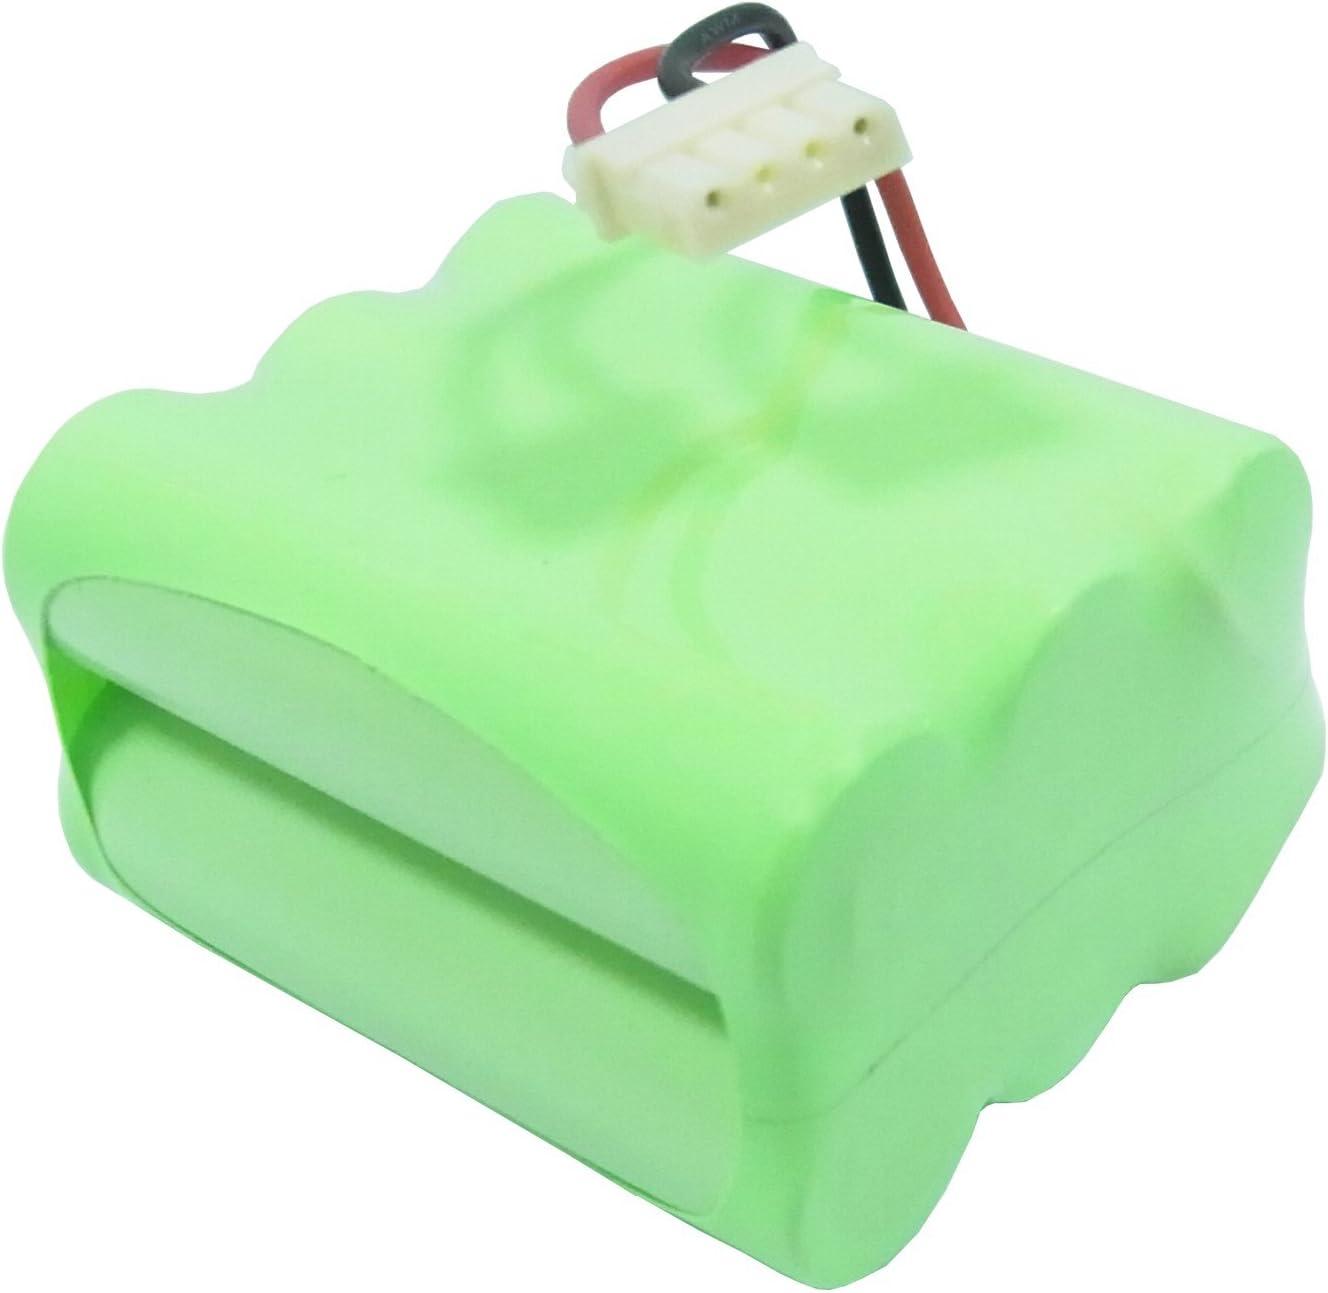 Braava 320 IROBOT Braava 321 replaces 4408927 CS-IRB320VX Battery 1500mAh compatible with GPRHC152M073